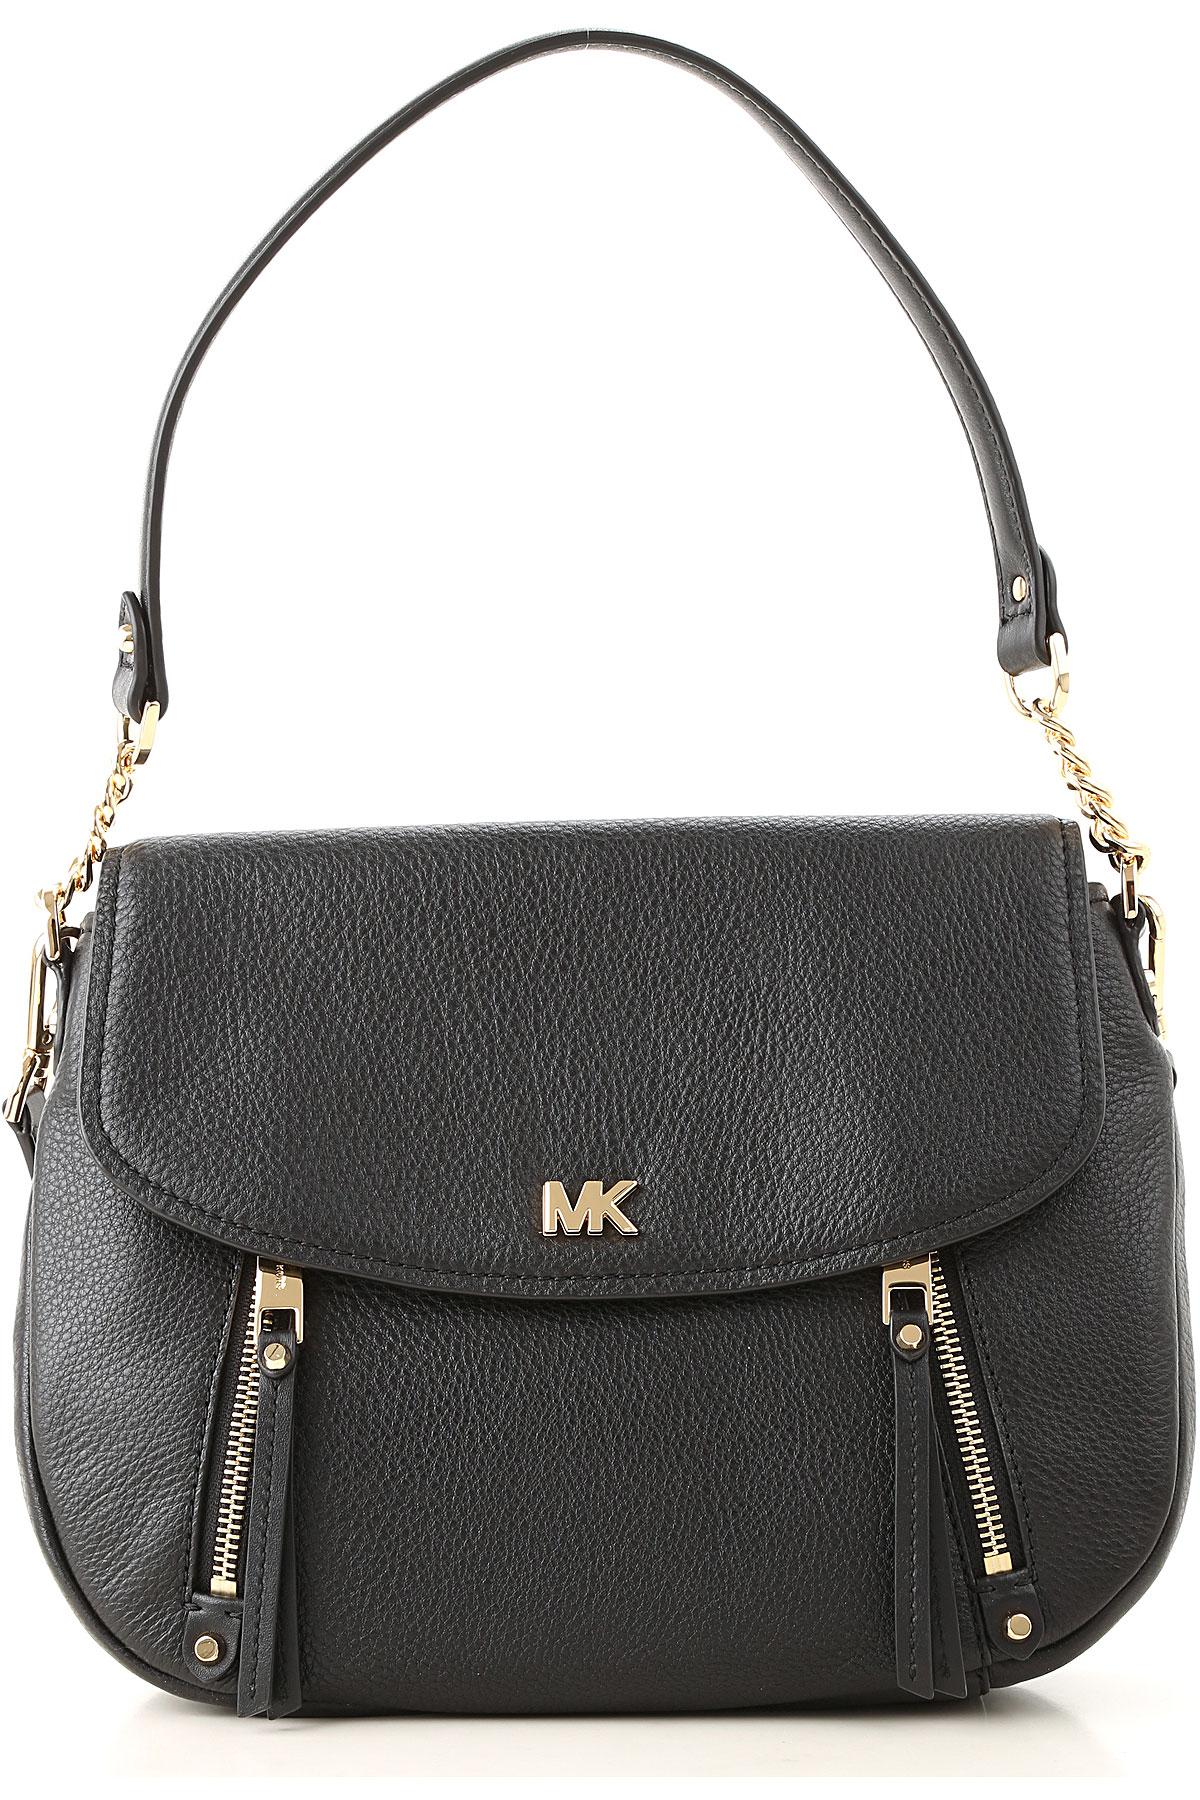 Handbags Michael Kors, Style code: 30s8gzuf2l 001